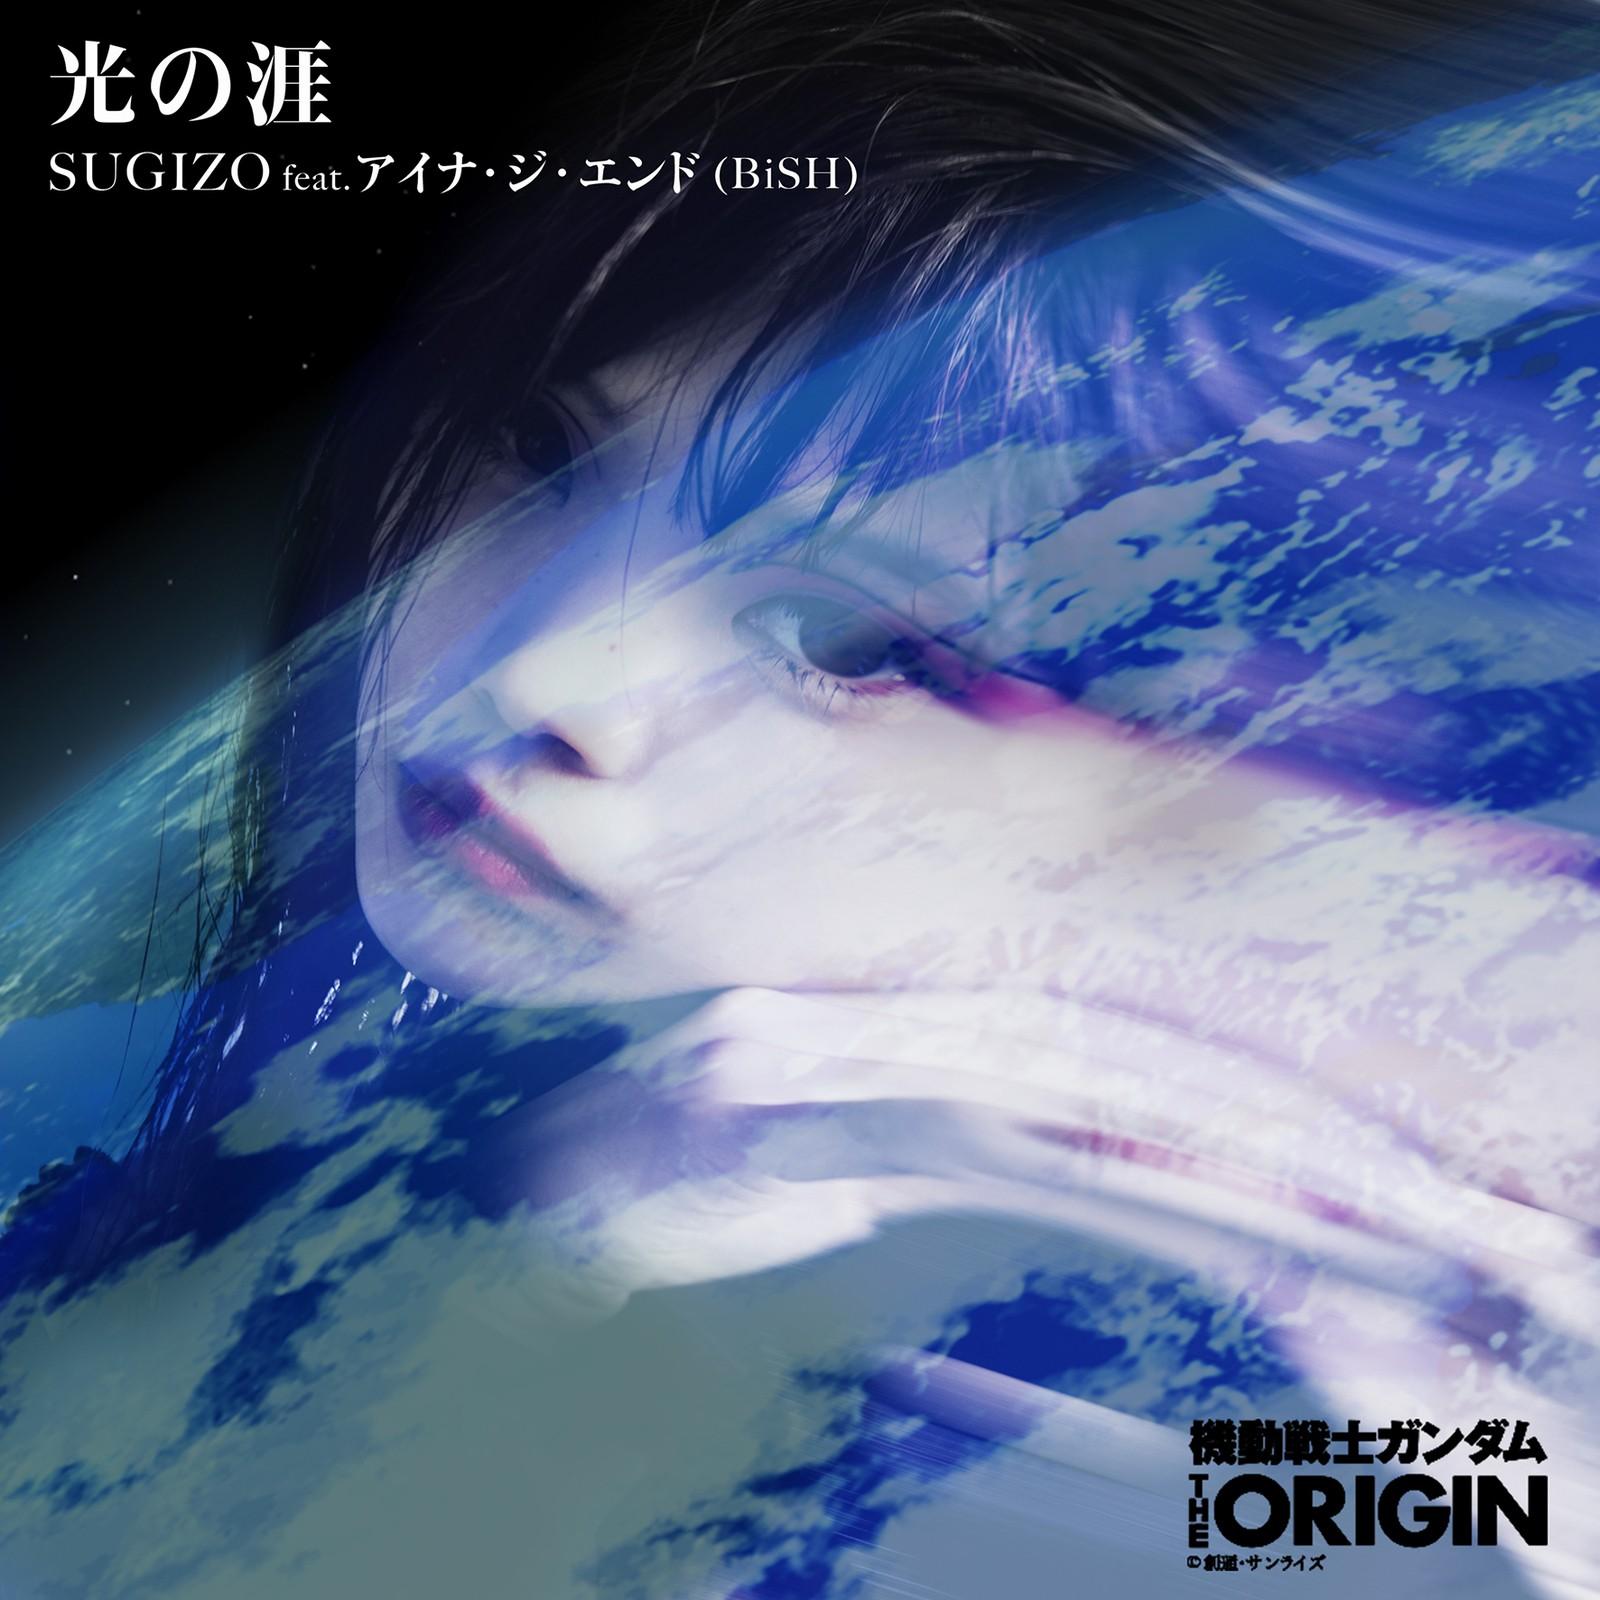 SUGIZO feat. アイナ・ジ・エンド(BiSH) – 光の涯 [FLAC / 24bit Lossless / WEB] [2019.08.13]